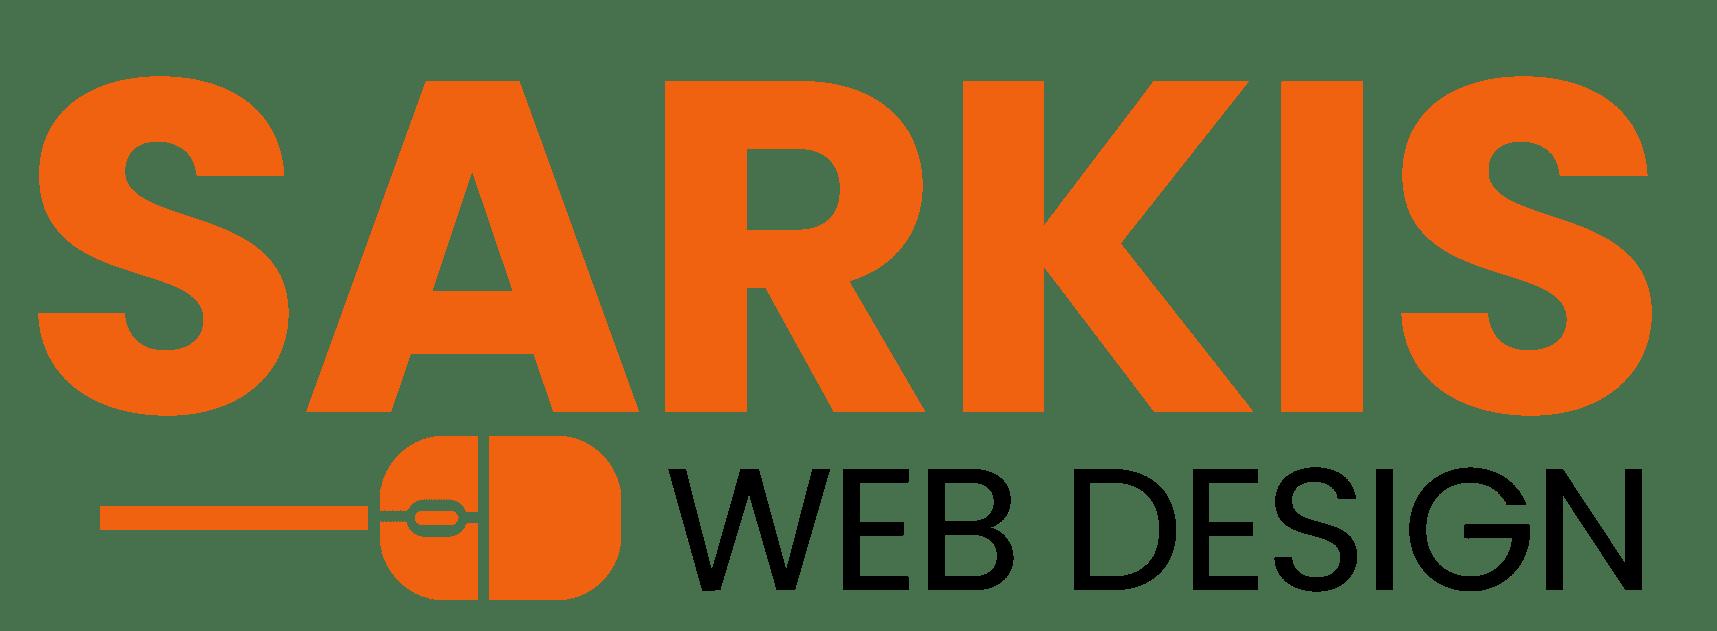 Sarkis Webdesign